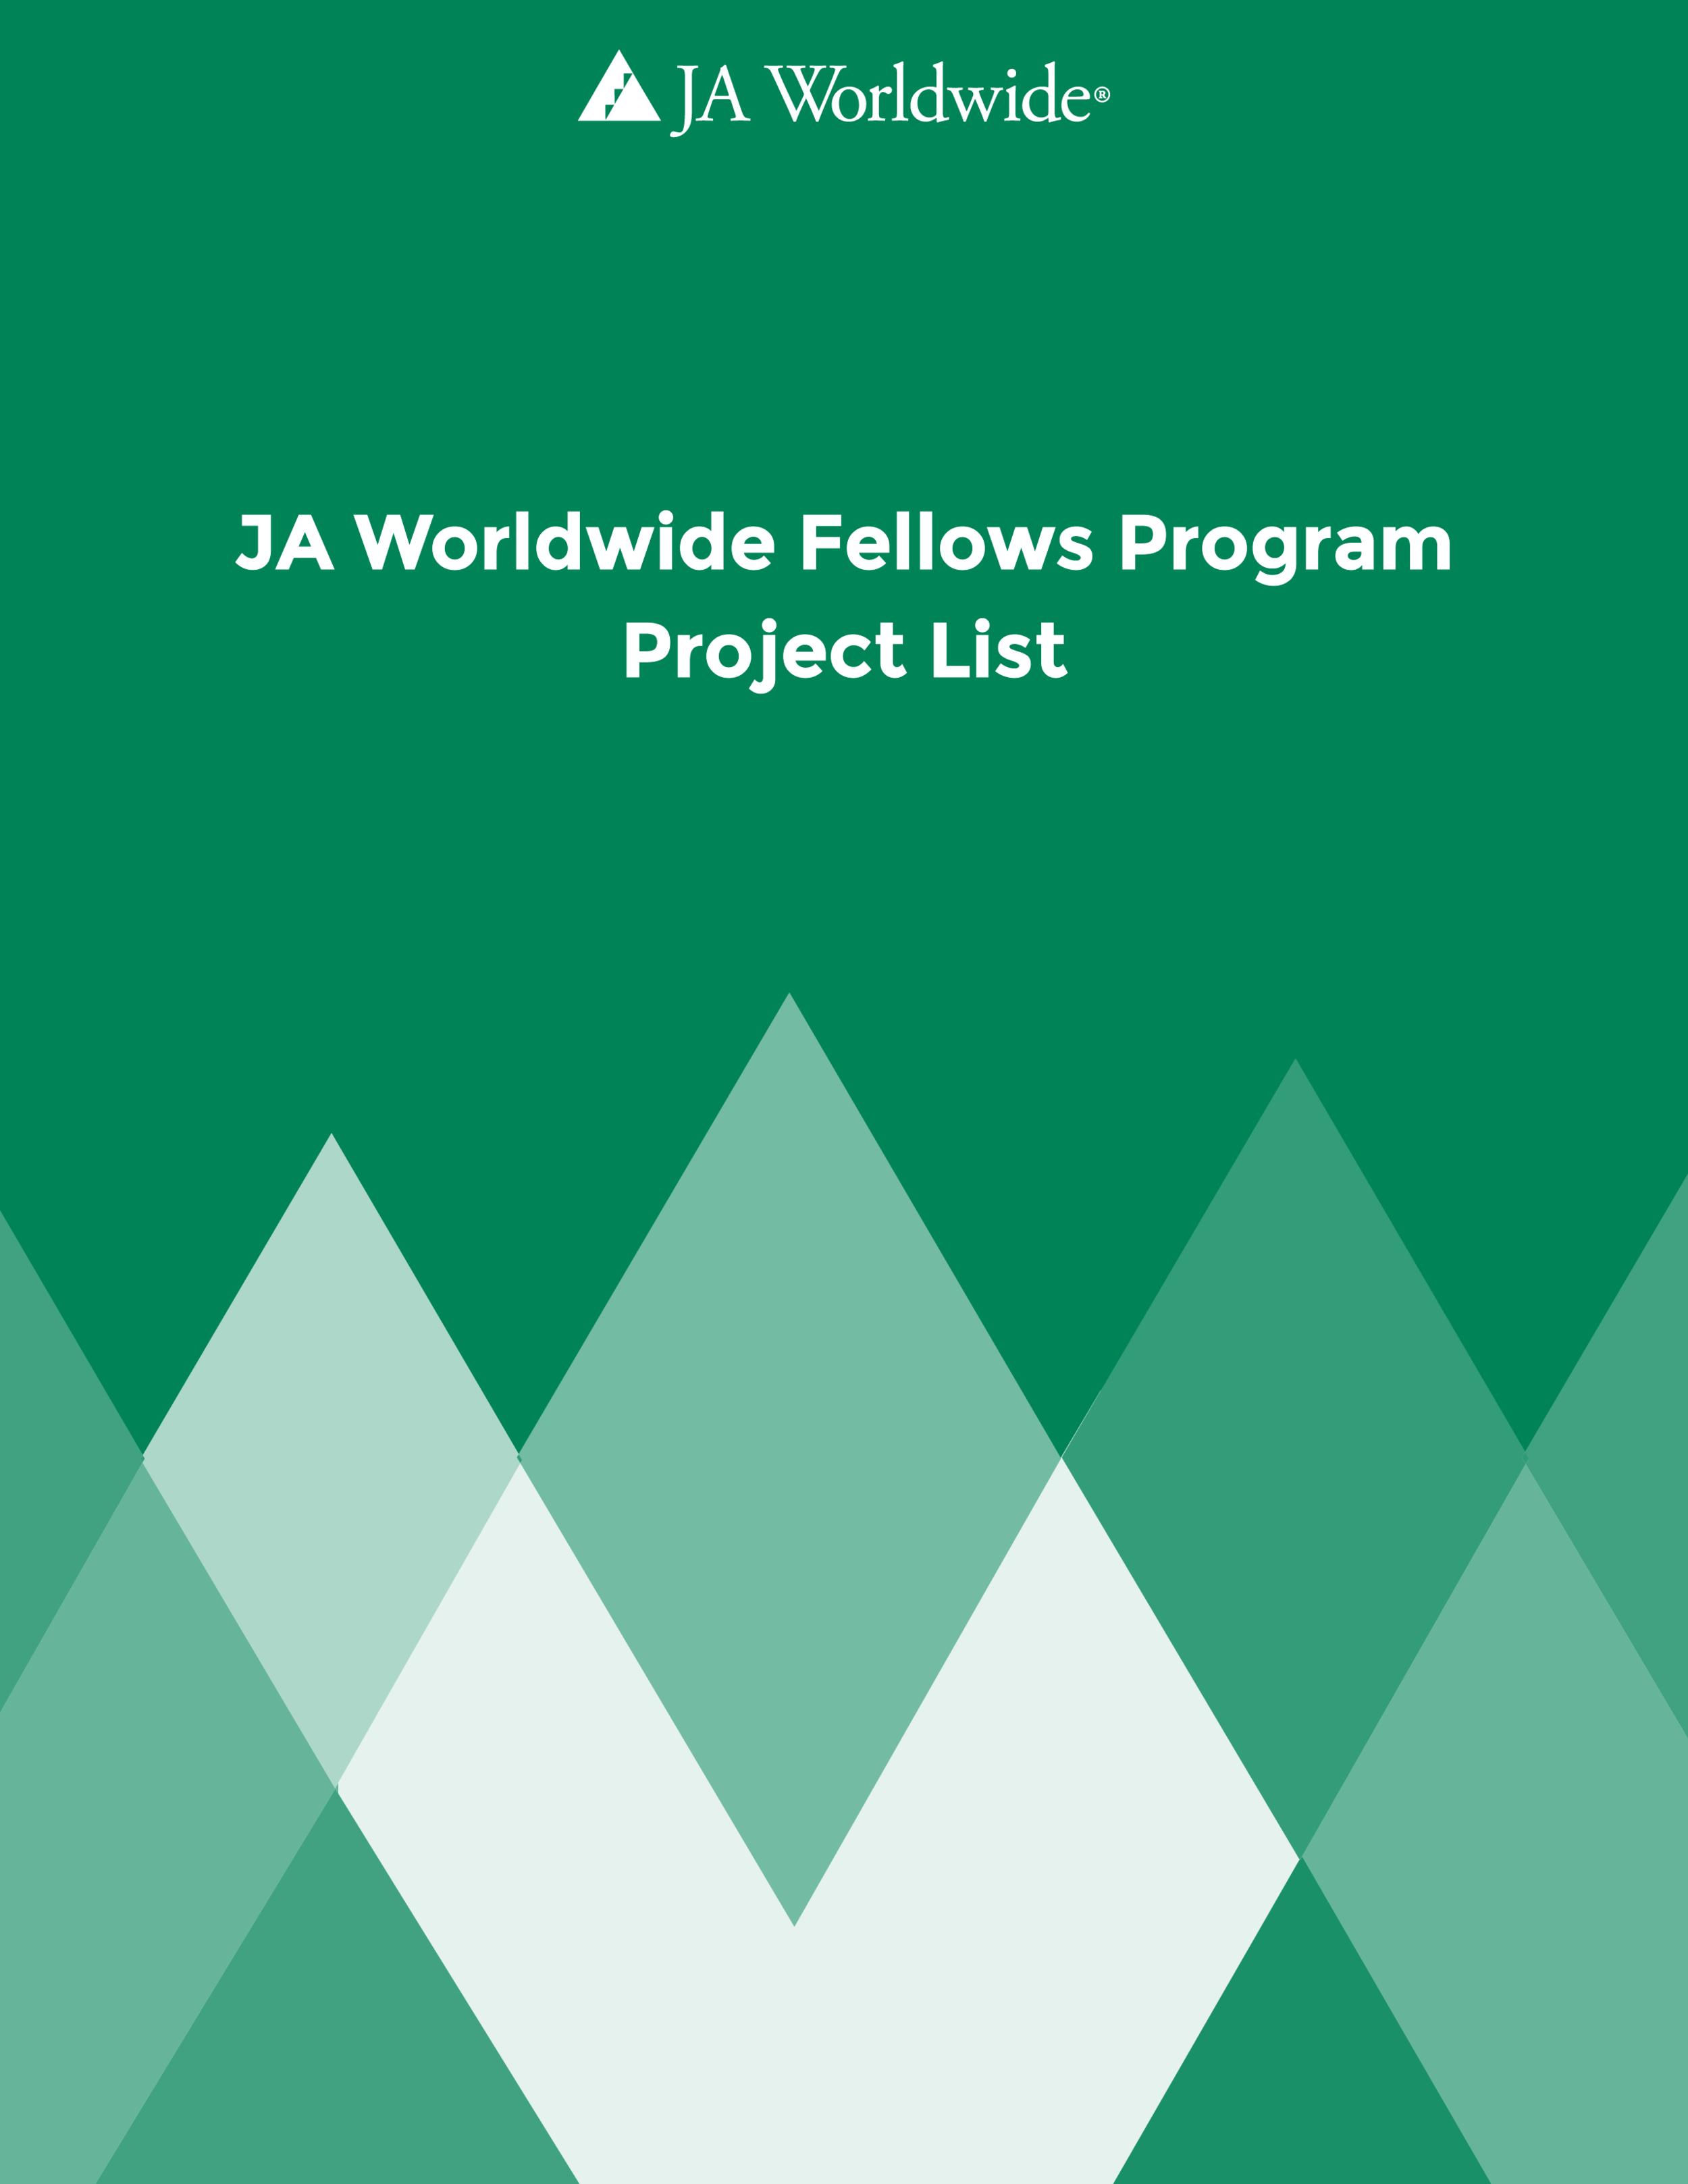 JA WORLDWIDE FELLOWS PROGRAM PROJECT LIST cover-01.png